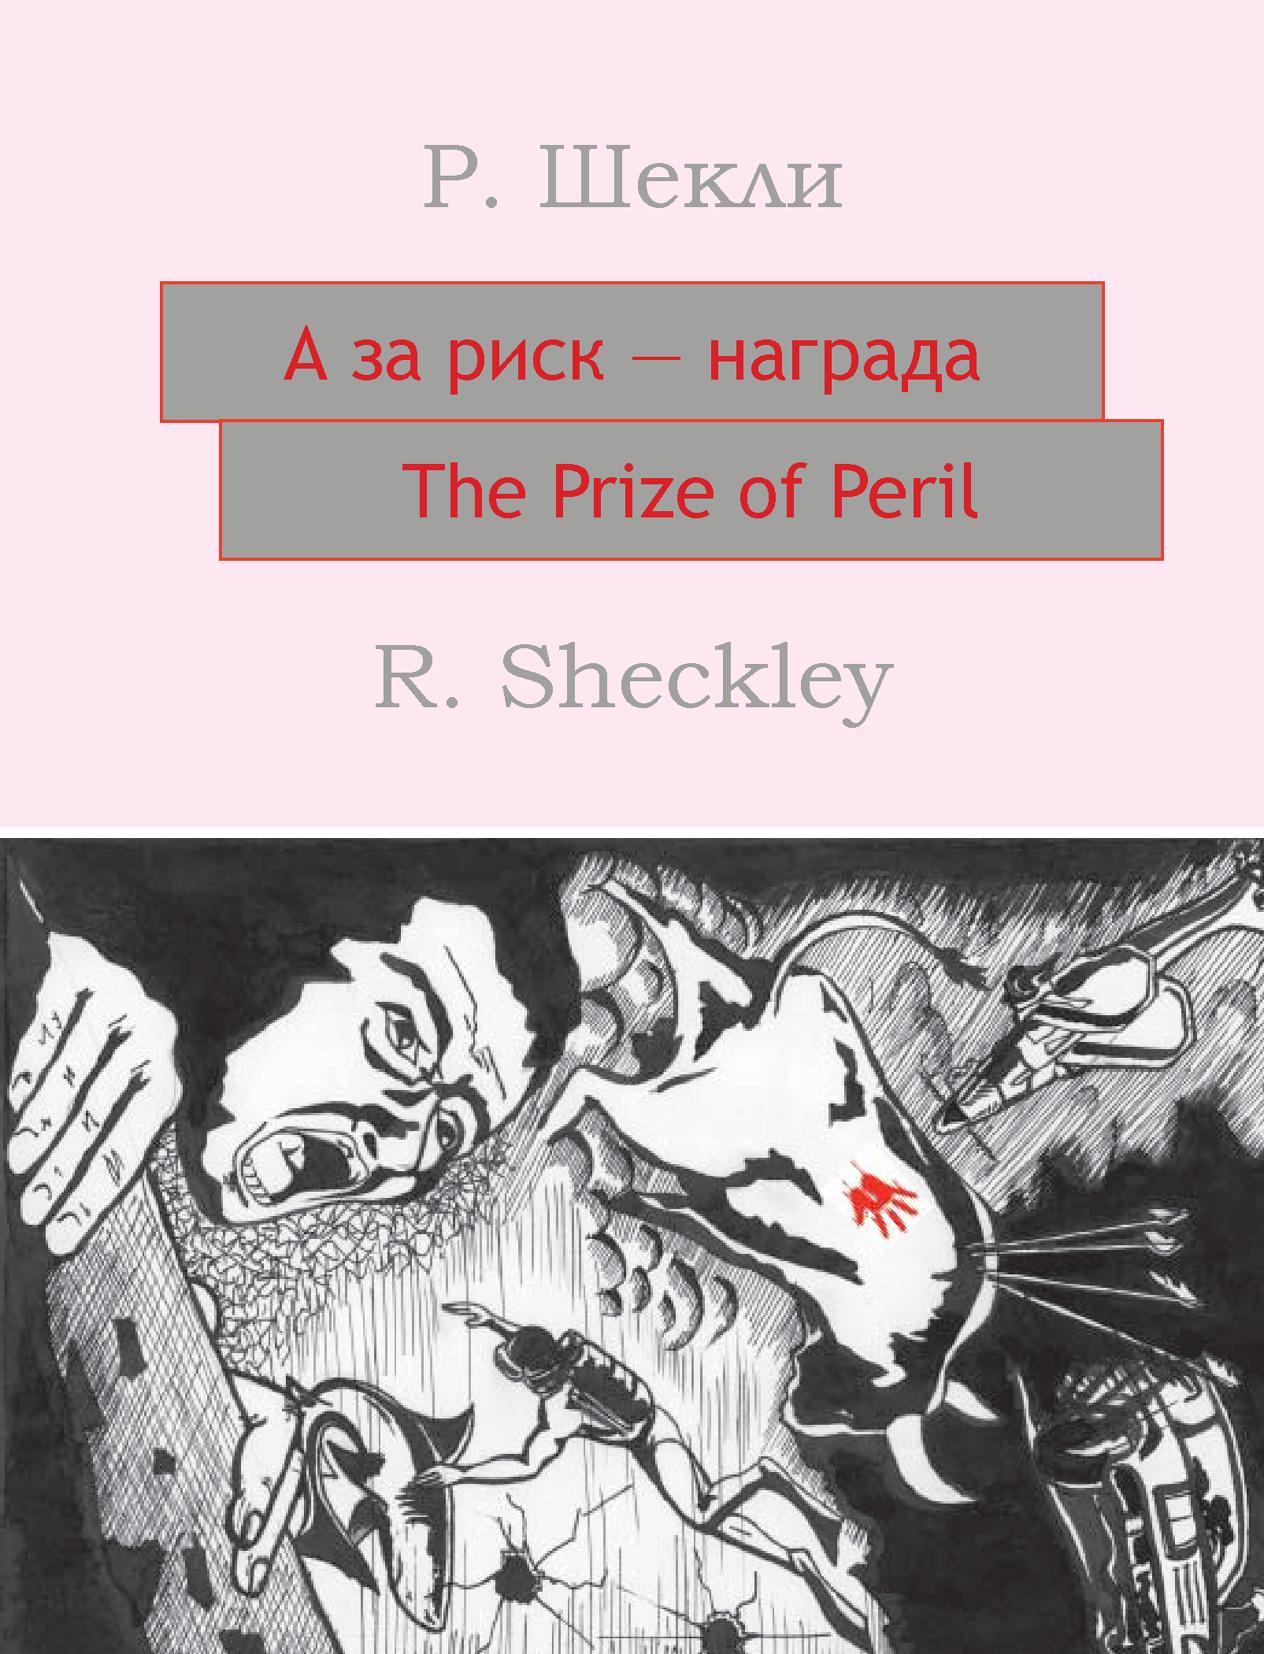 А за риск – награда! The Prize of Peril: На английском языке с параллельным русским текстом